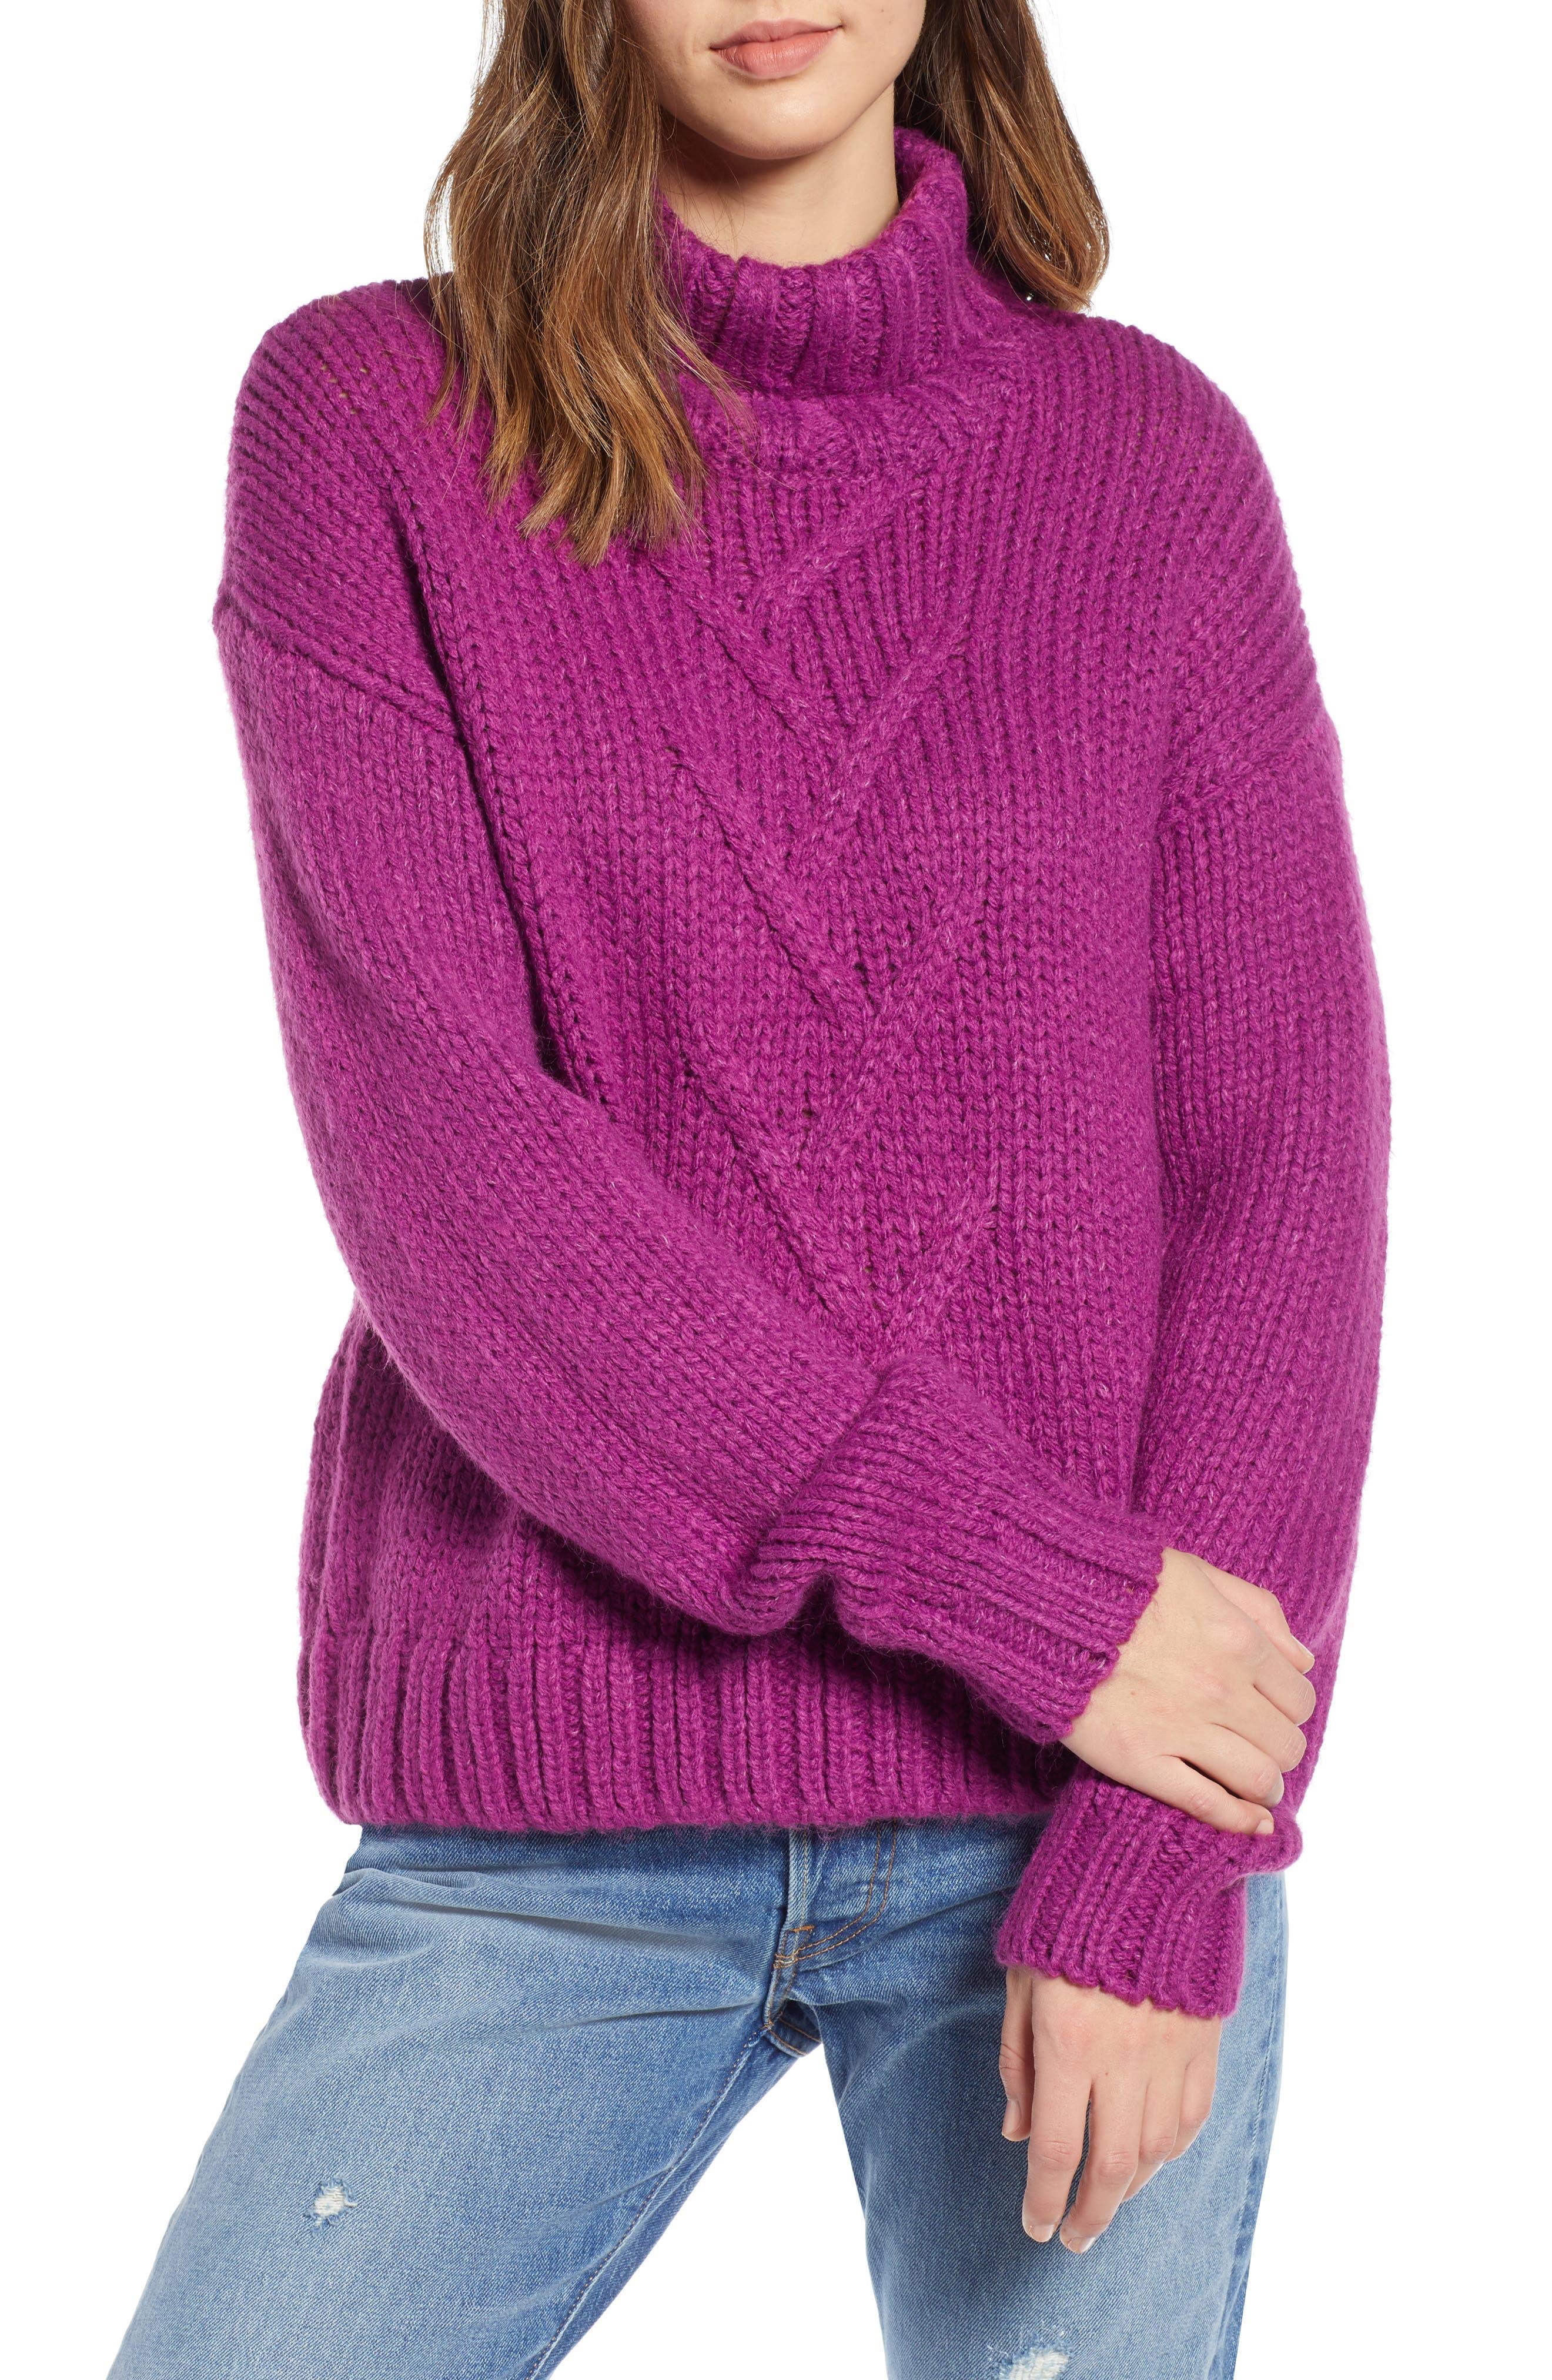 Kira Turtleneck Sweater,                             Main thumbnail 1, color,                             HOLLYHOCK